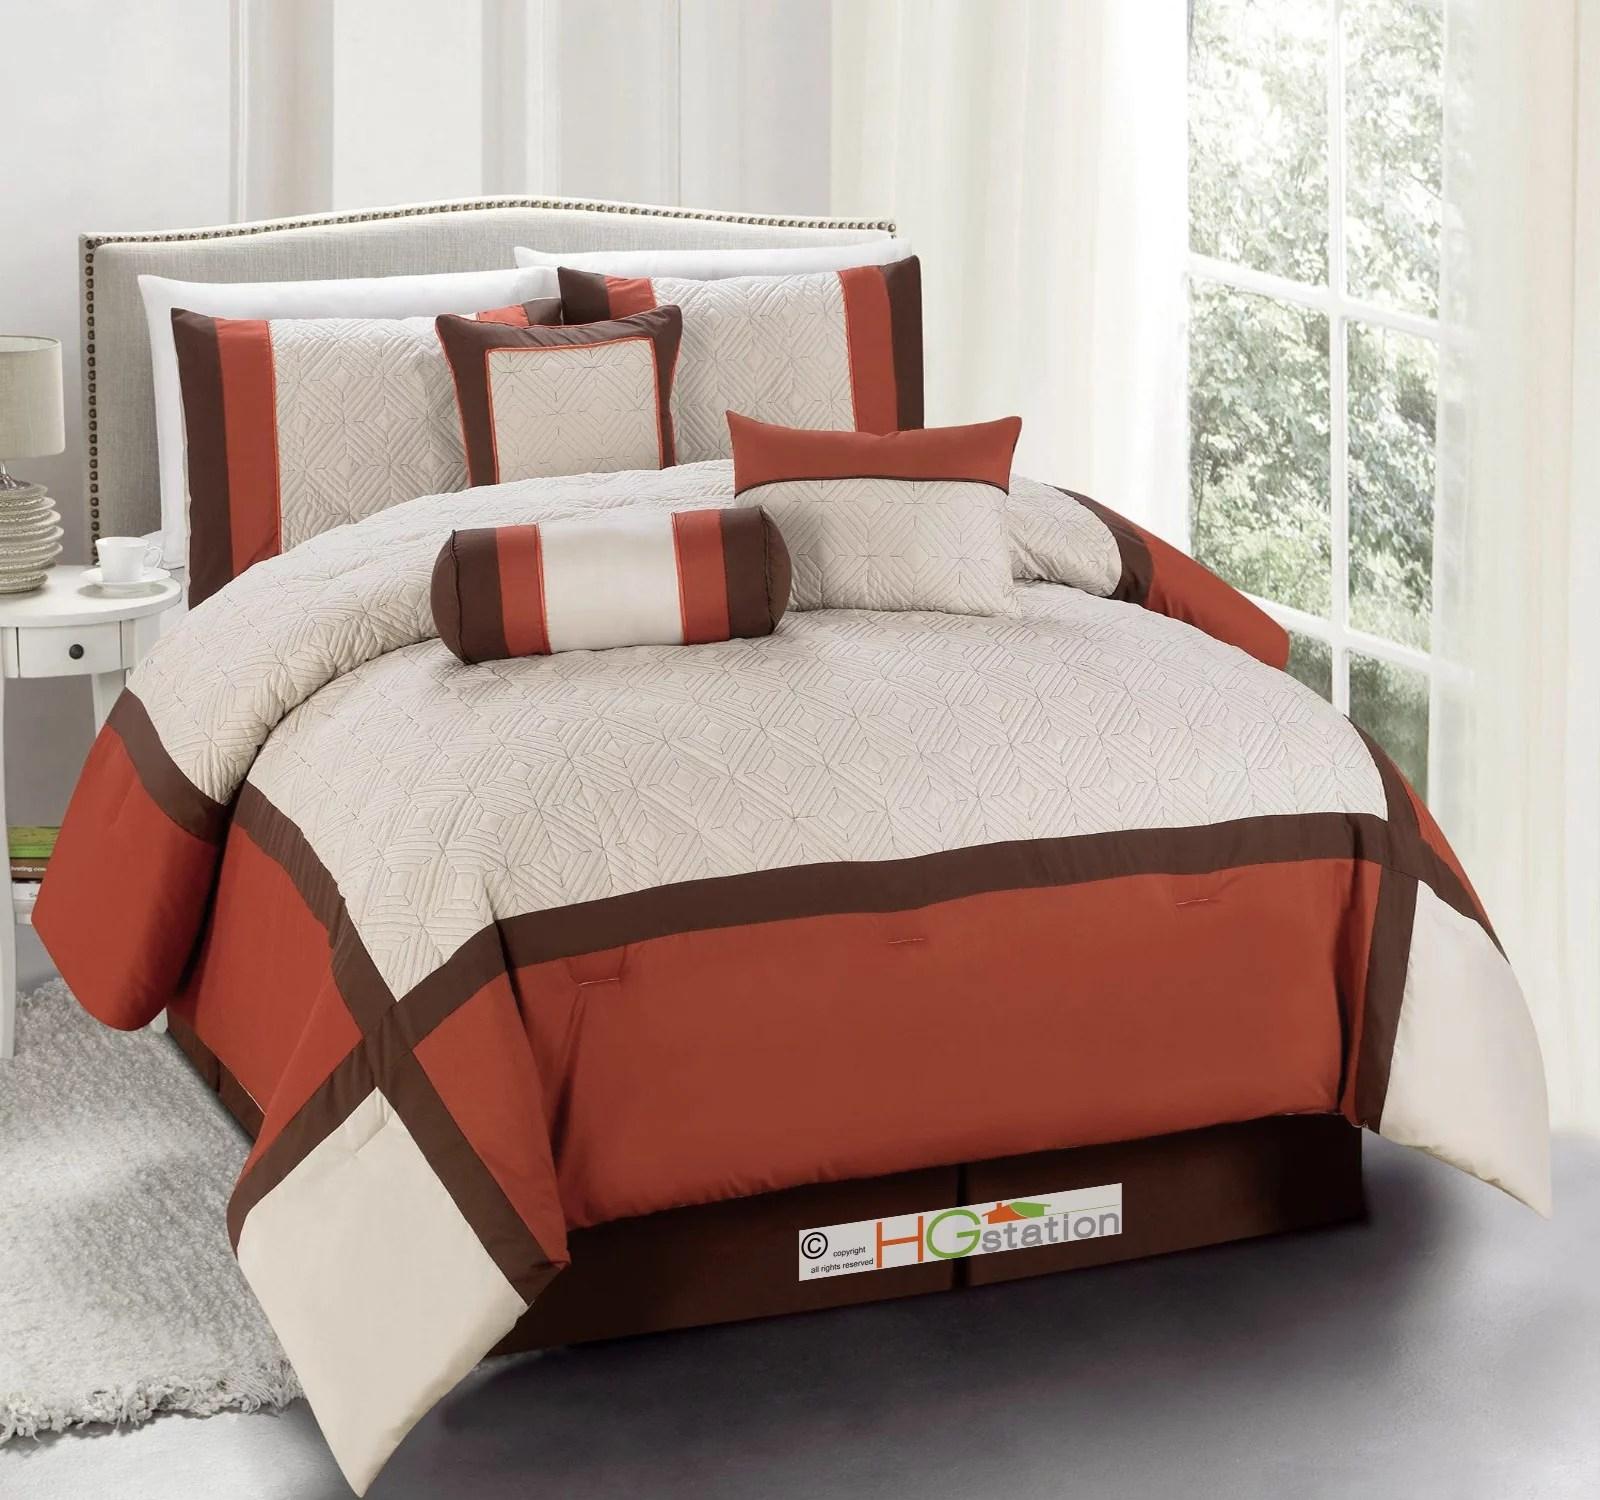 11 pc quilted diamond square patchwork modern comforter curtain set rust orange brown beige queen walmart com